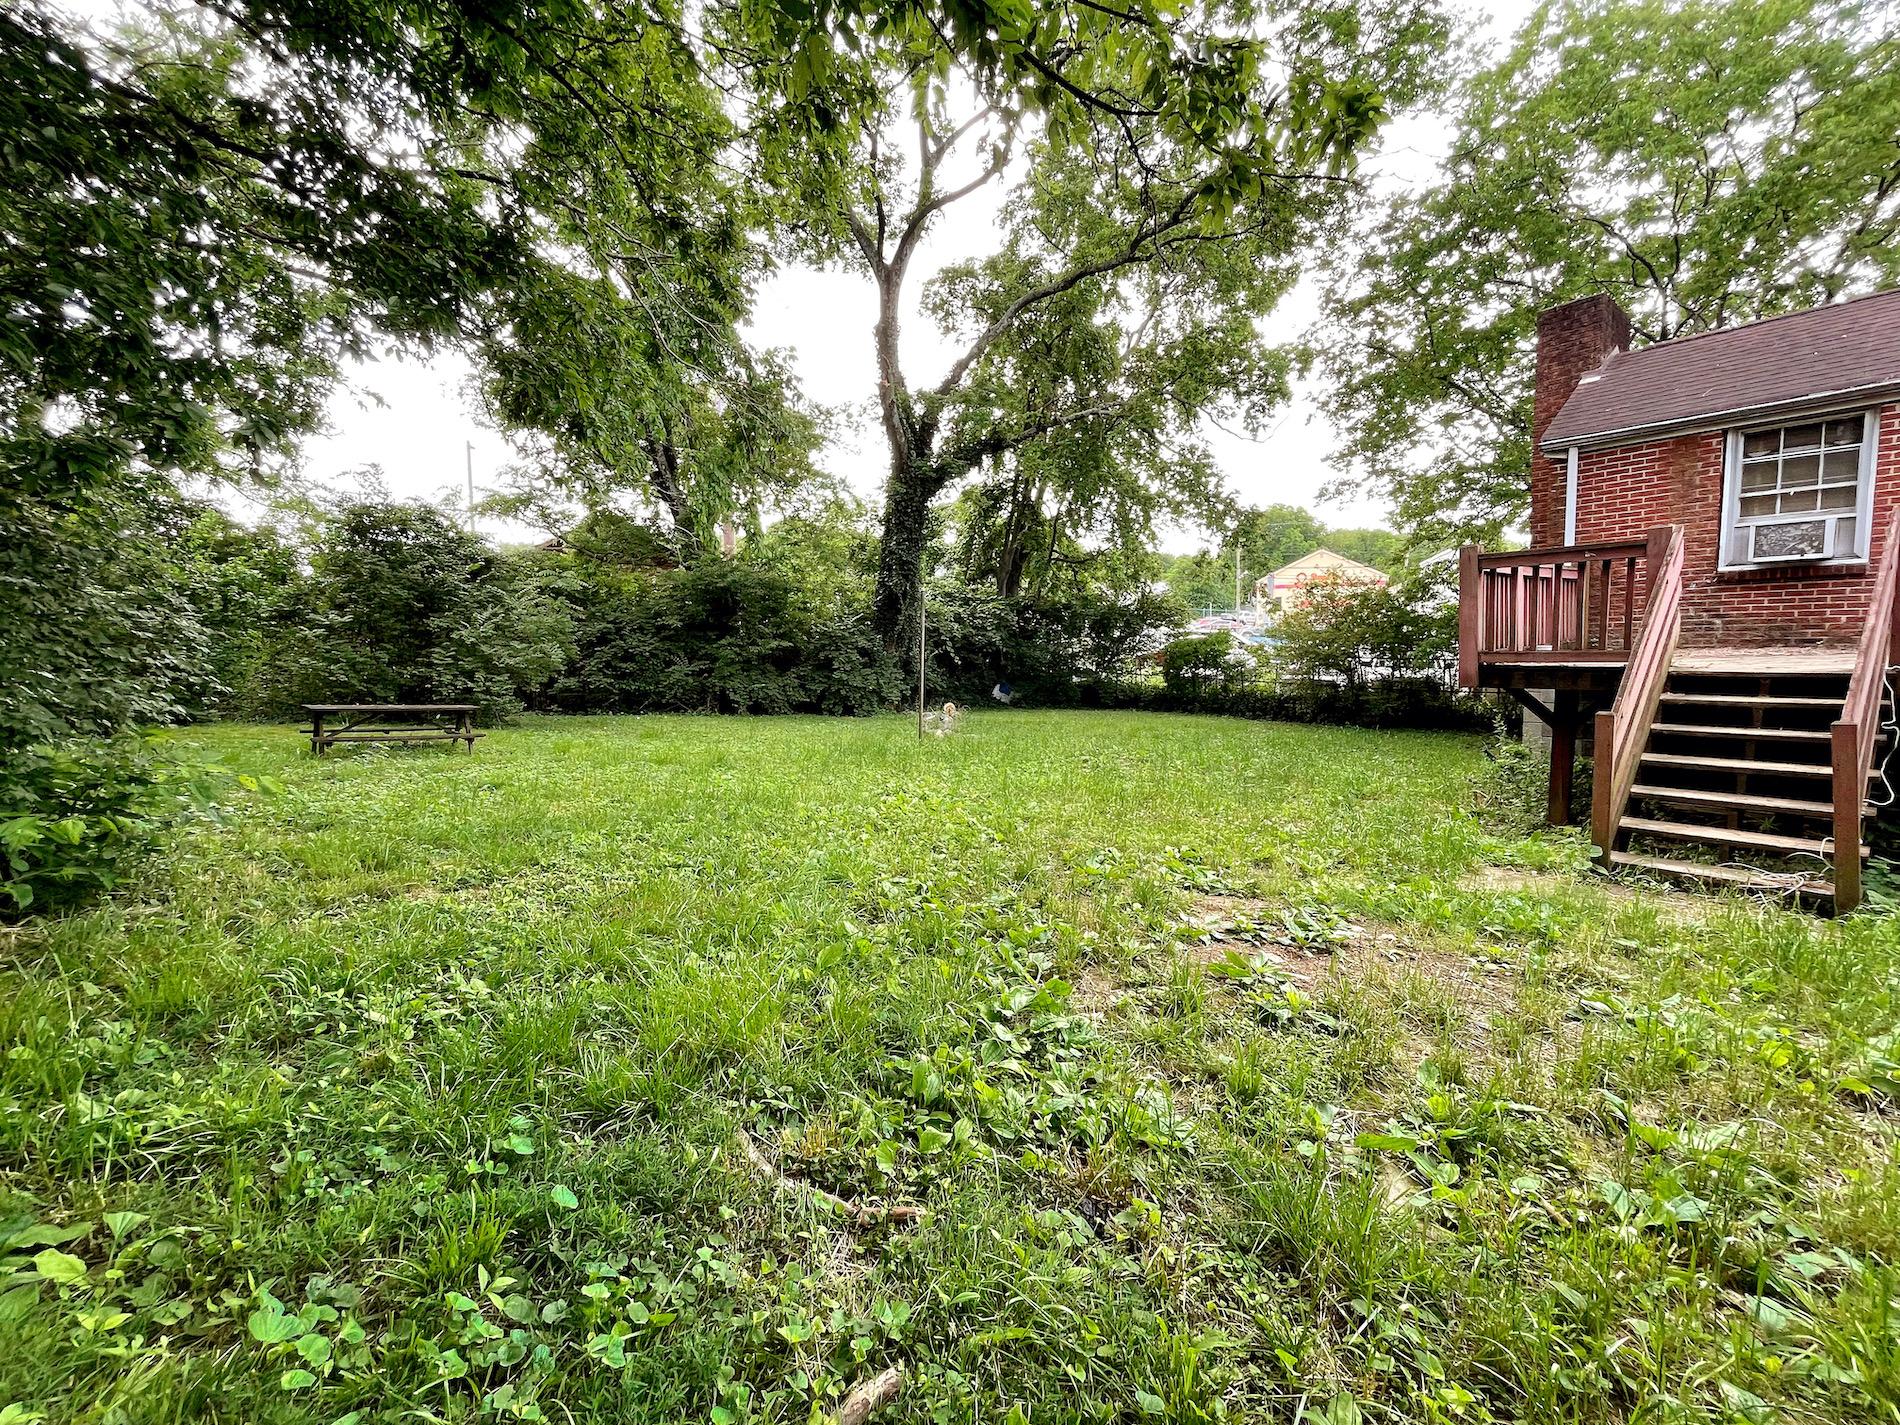 325 Morton Ave, Nashville, TN 37211 home for sale